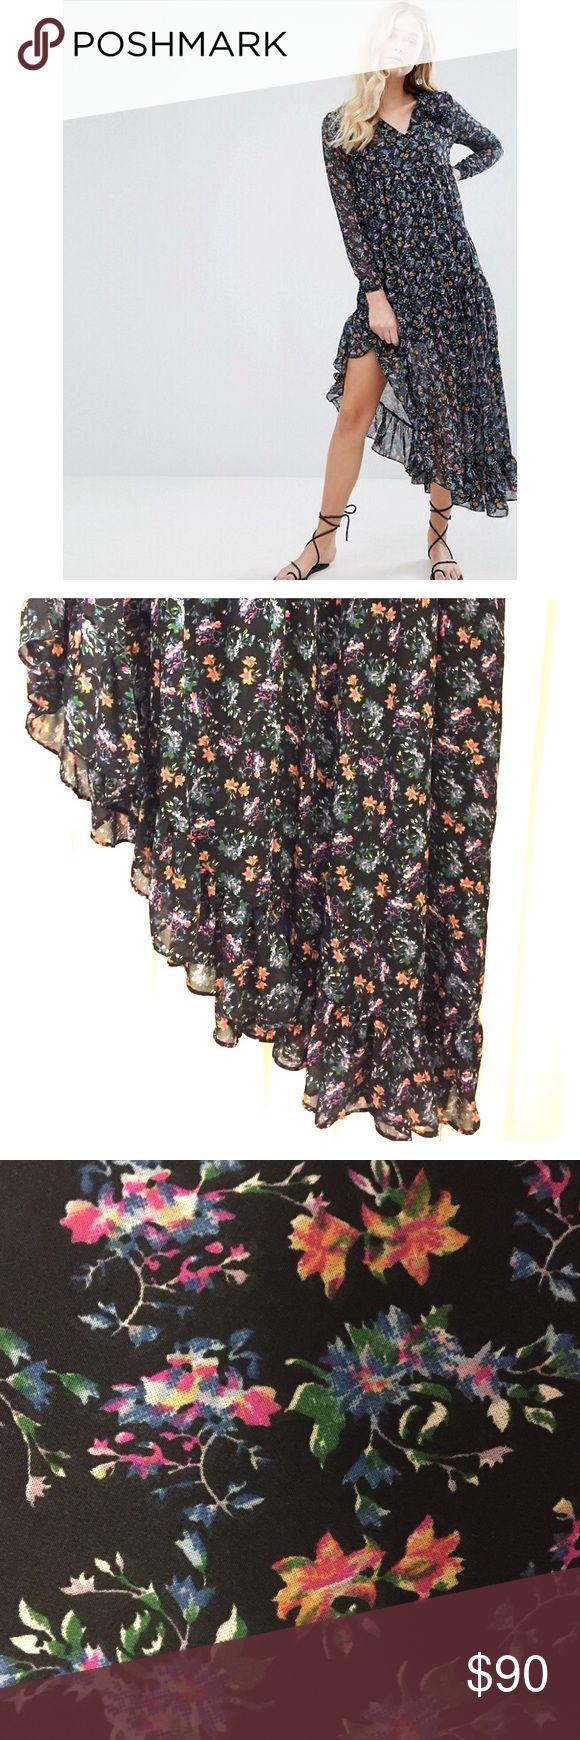 Walter Baker Benji Dress in Floral Medley Walter Baker Benji Dress in Floral Medley, Size 8. NWT. Fully Lined & Stunning Asymmetrical ruffled bottom. Walter Baker Dresses